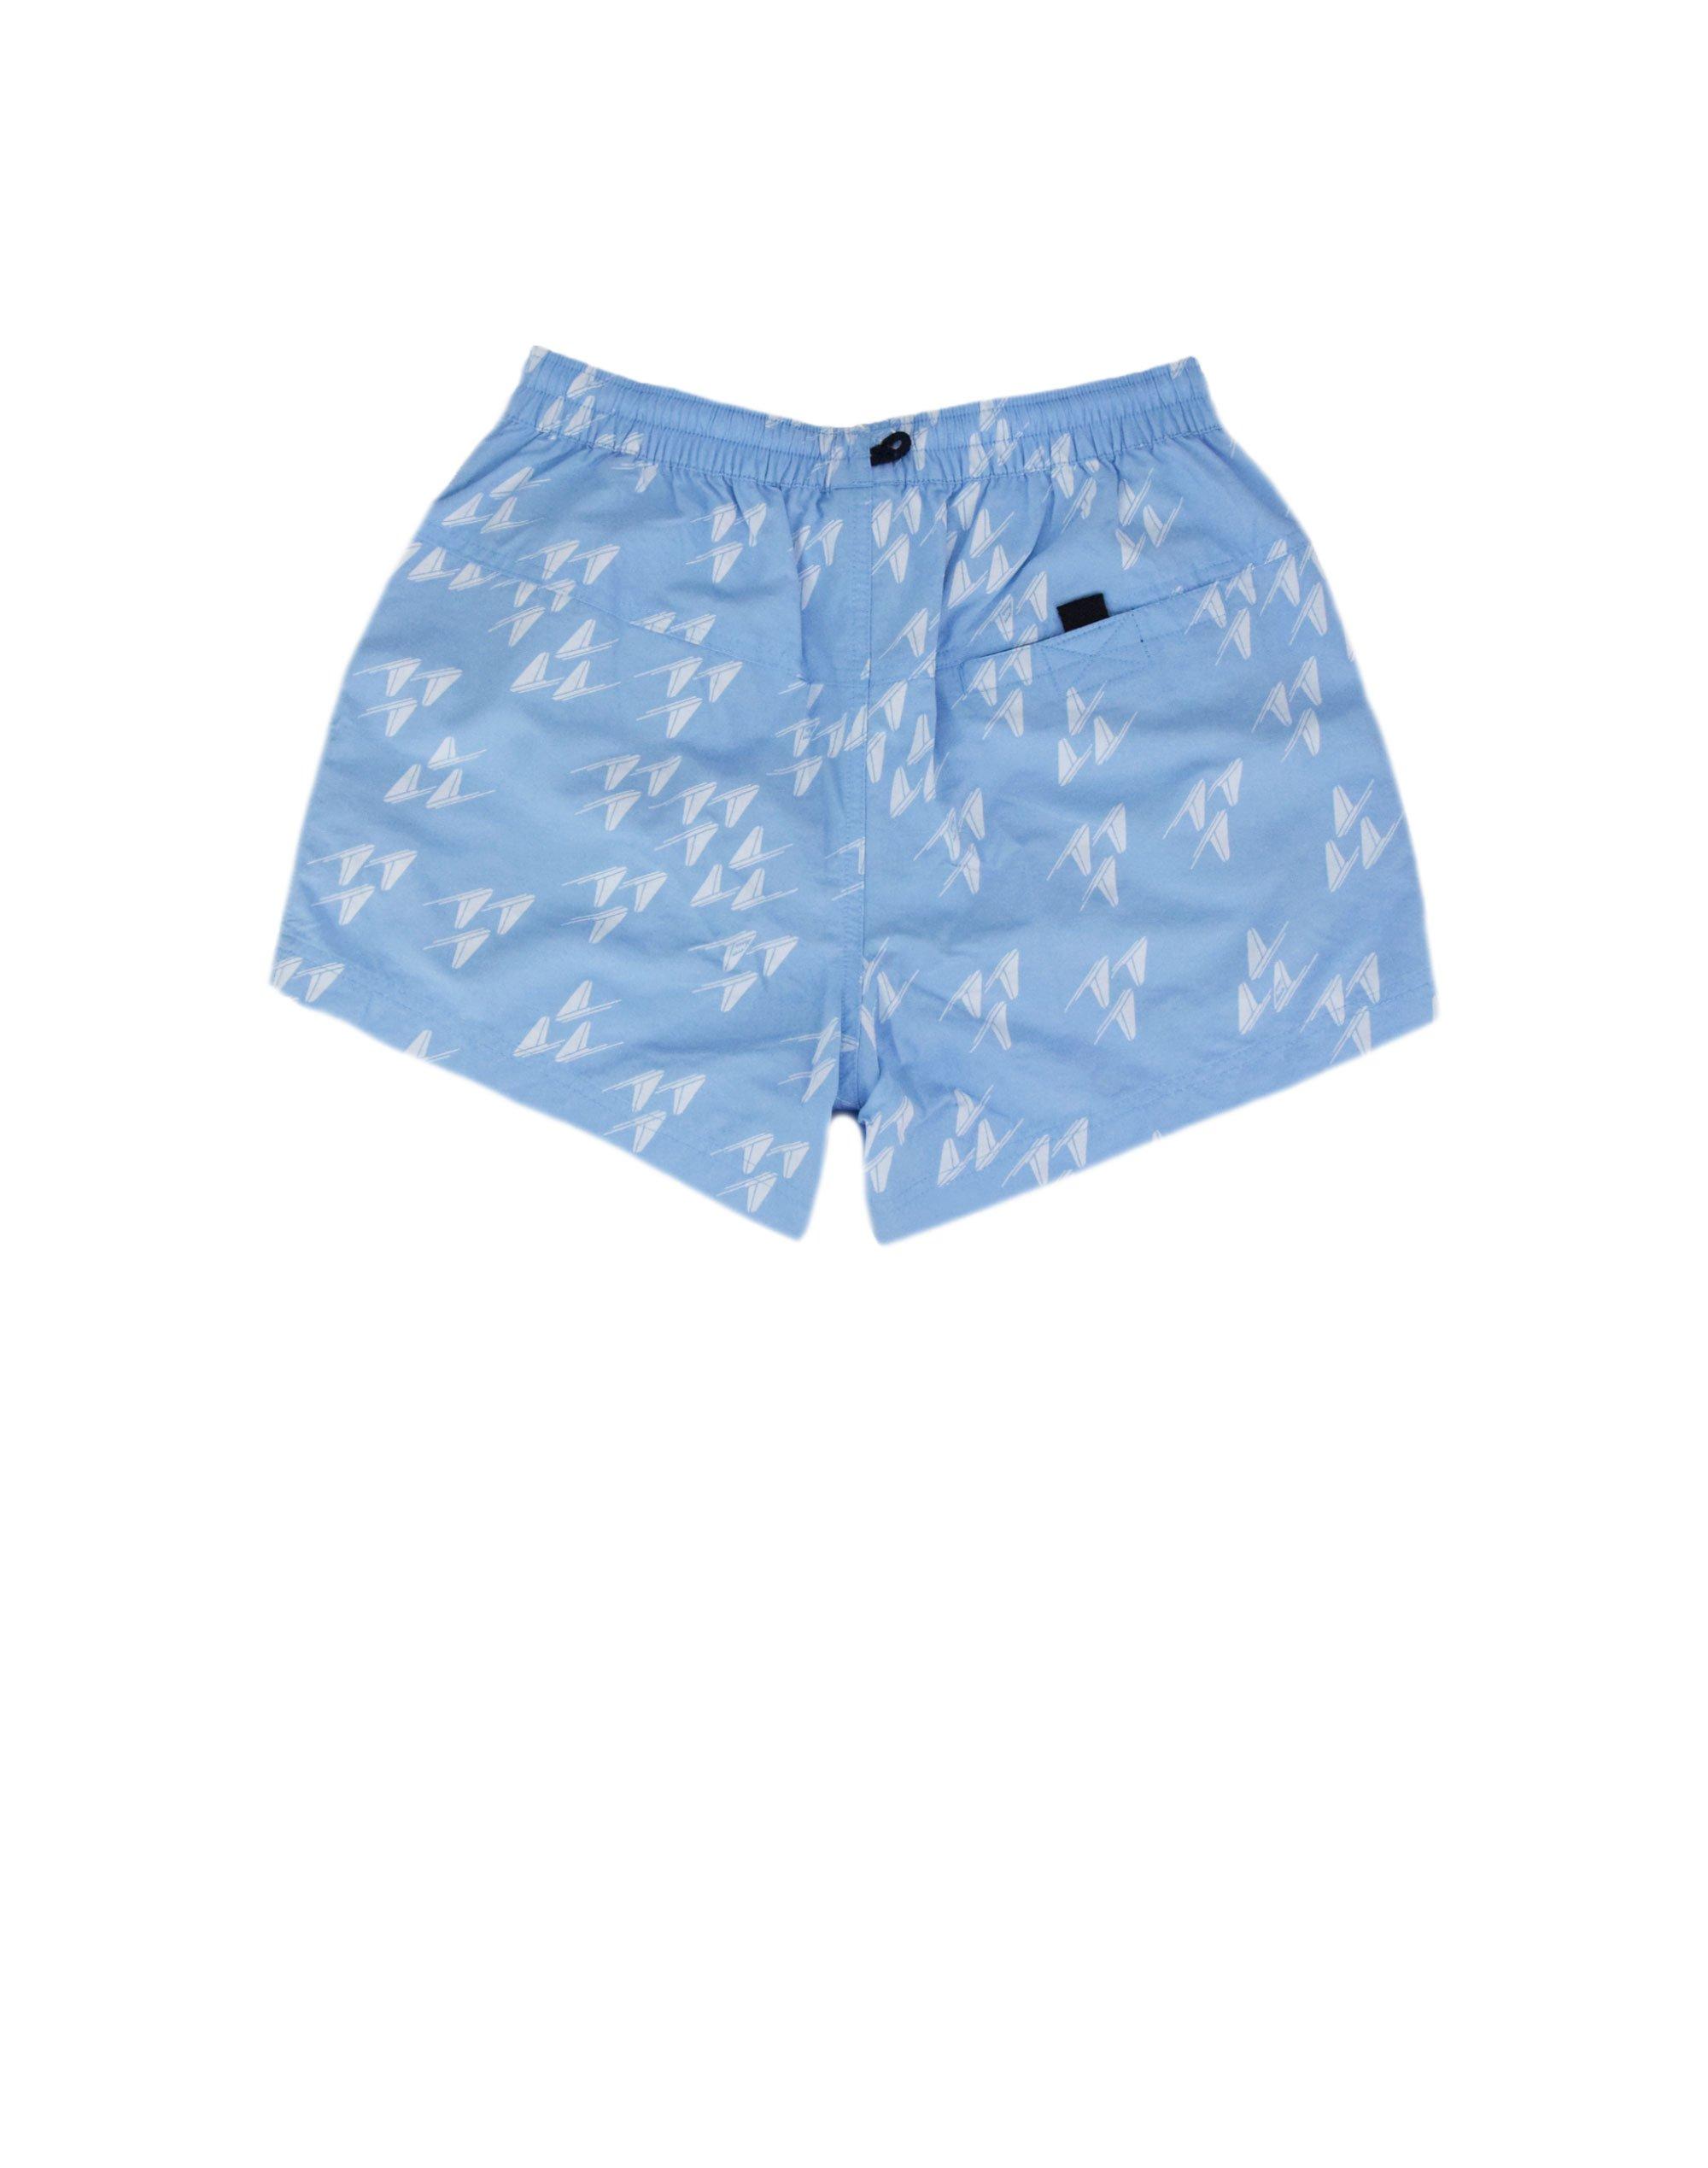 Helly Hansen Colwell Trunk (33970-608) Coast Blue